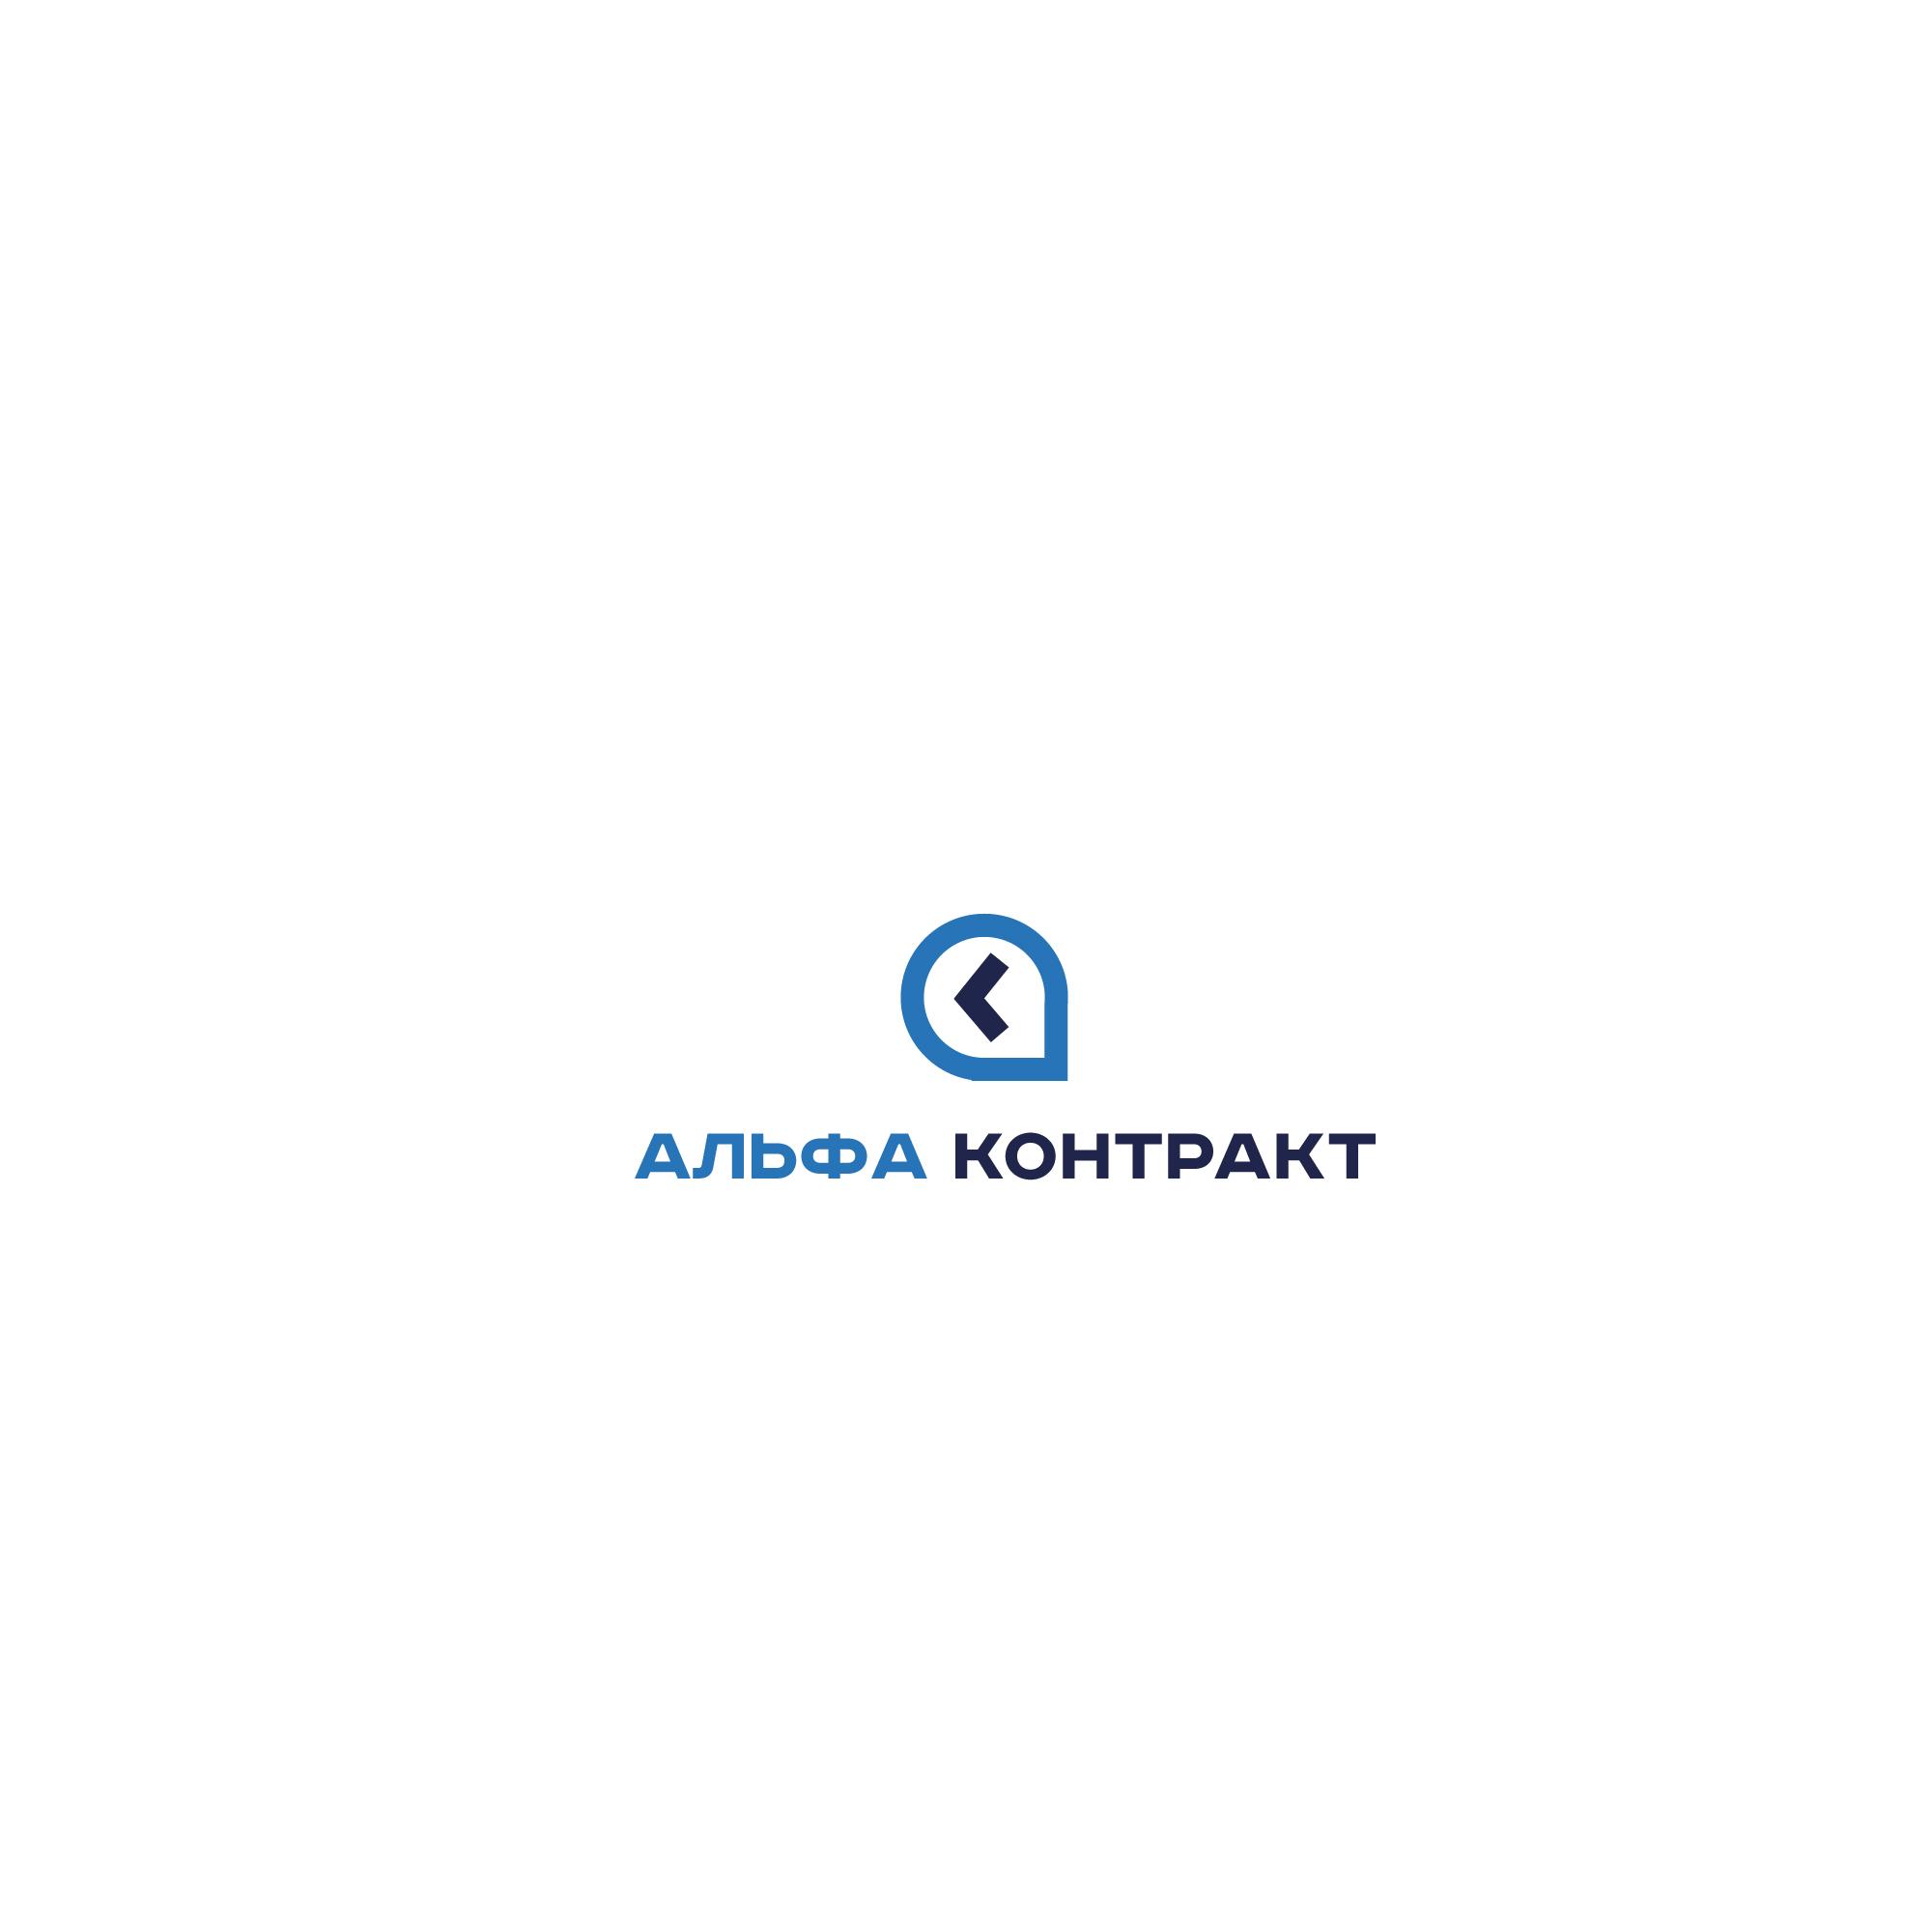 Дизайнер для разработки логотипа компании фото f_8415bfd270b13eb5.jpg